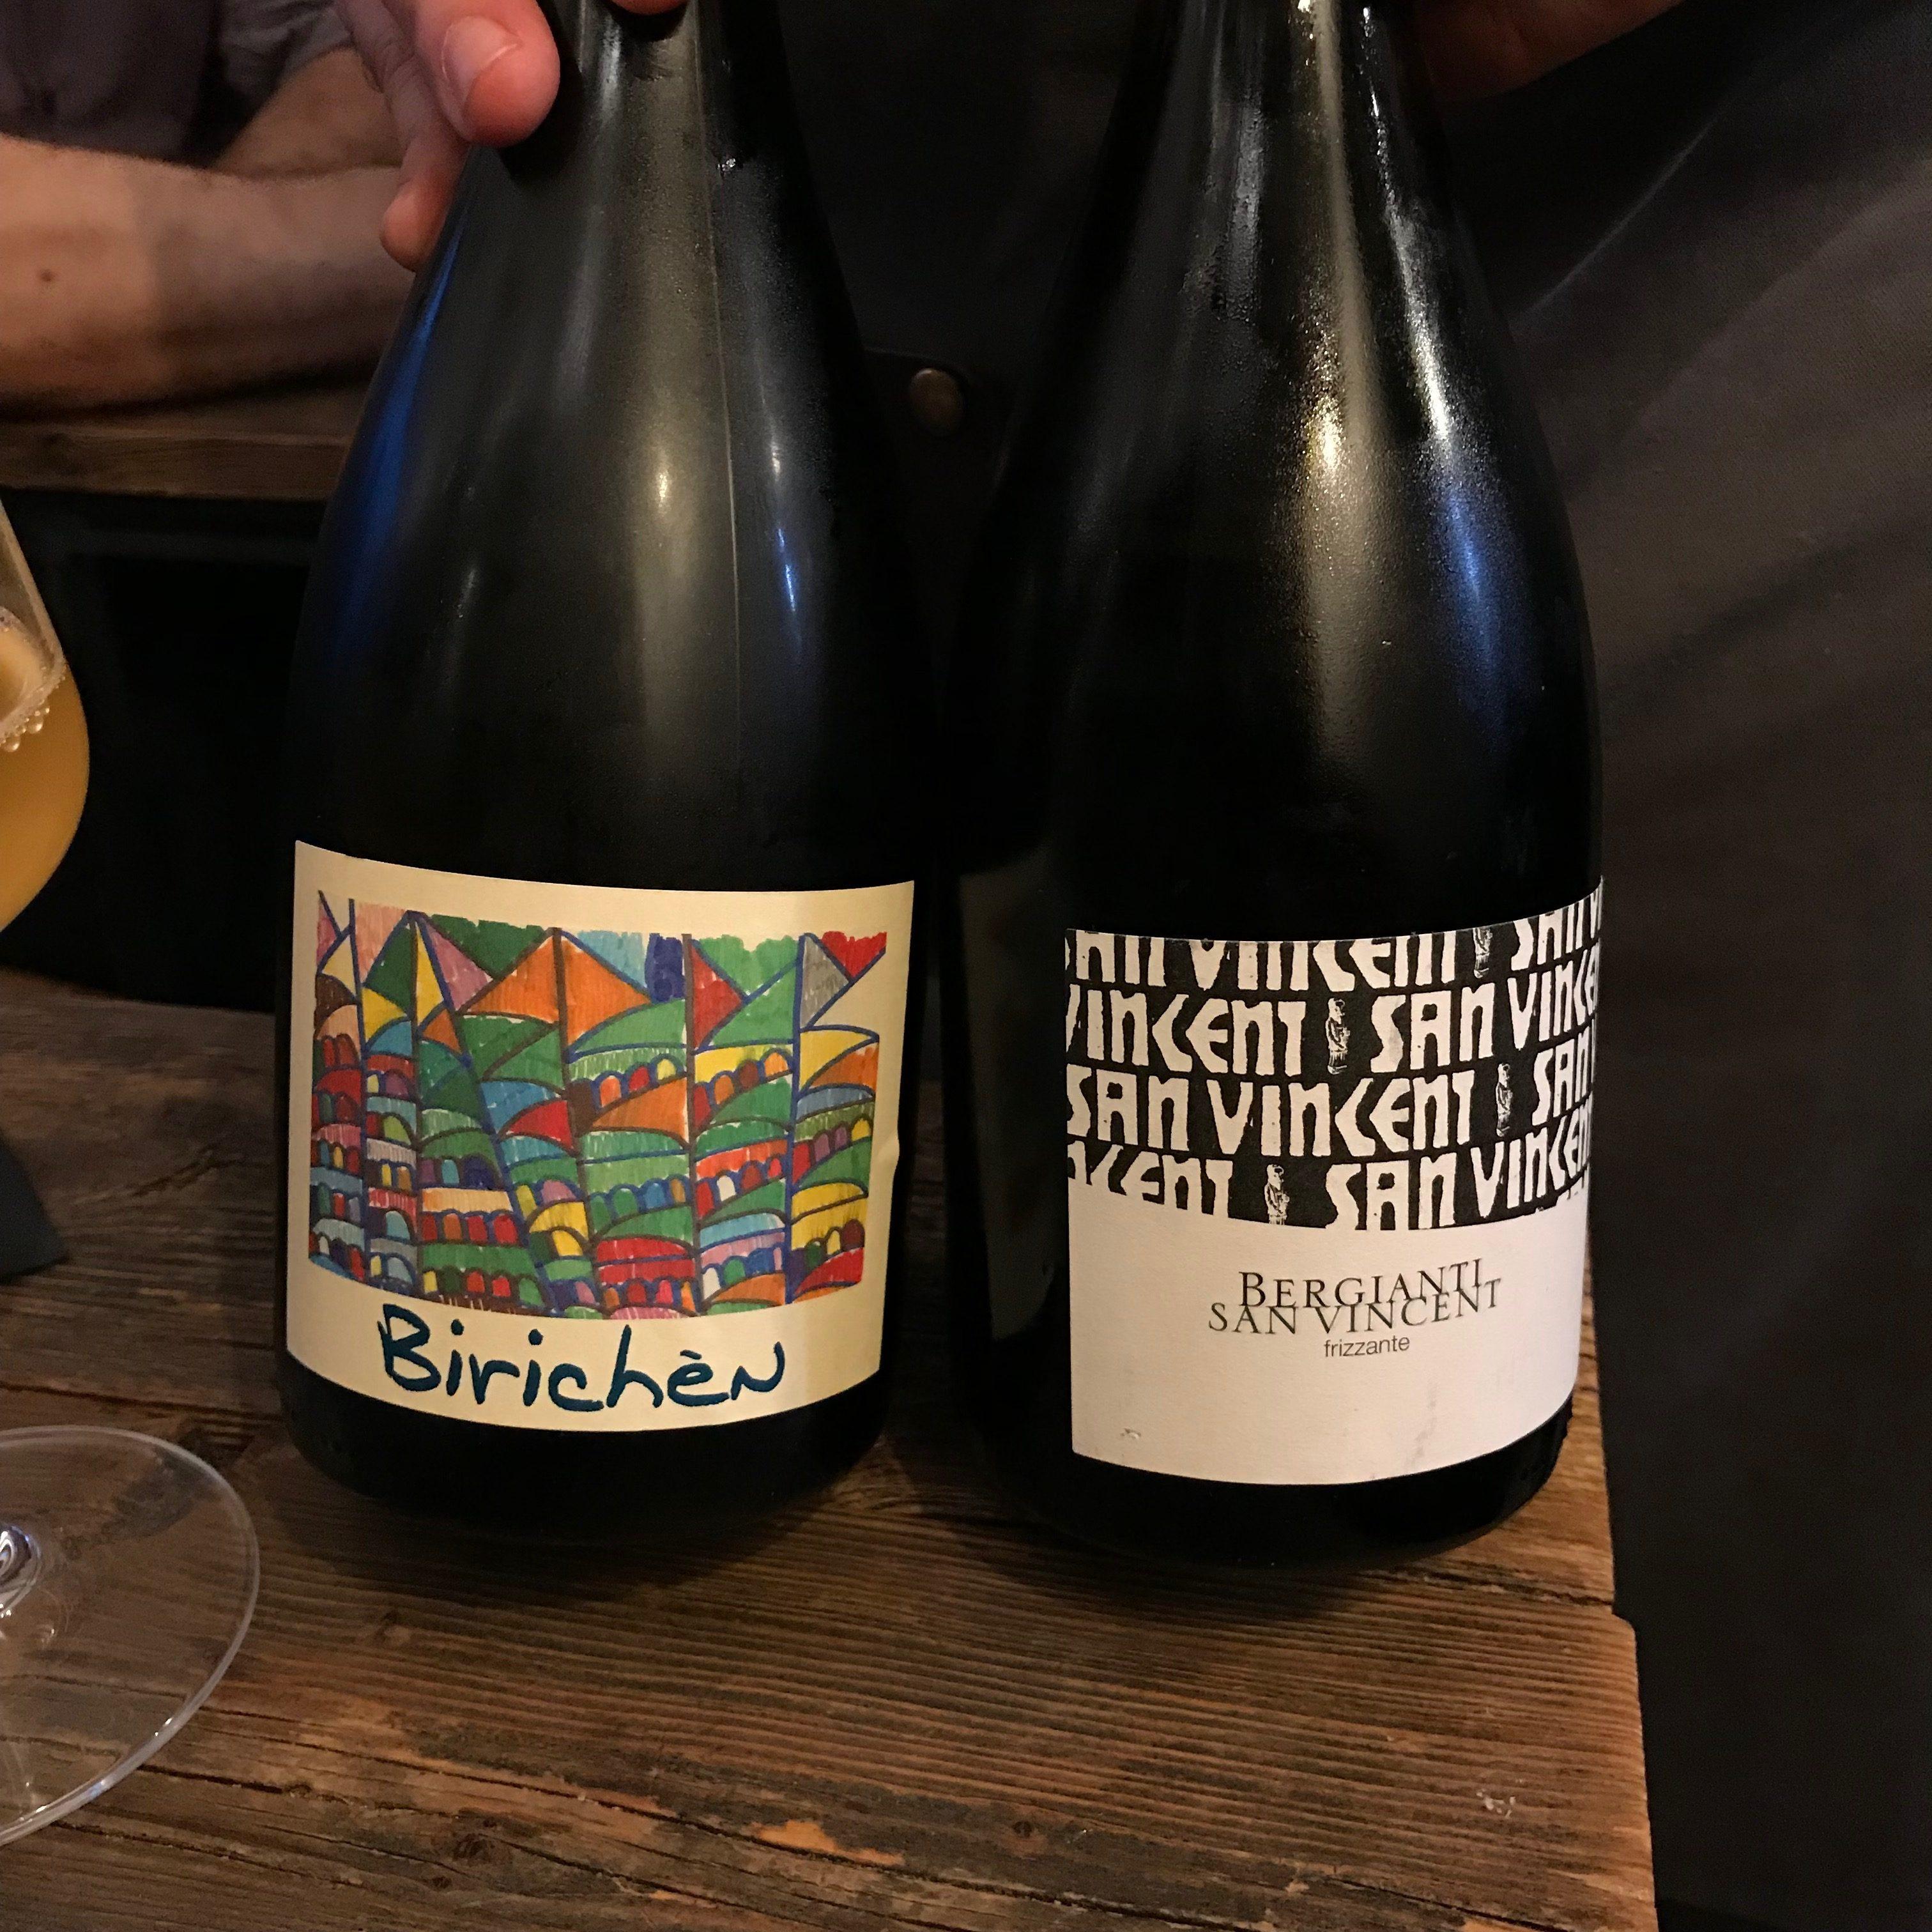 Rifermentato in bottiglia